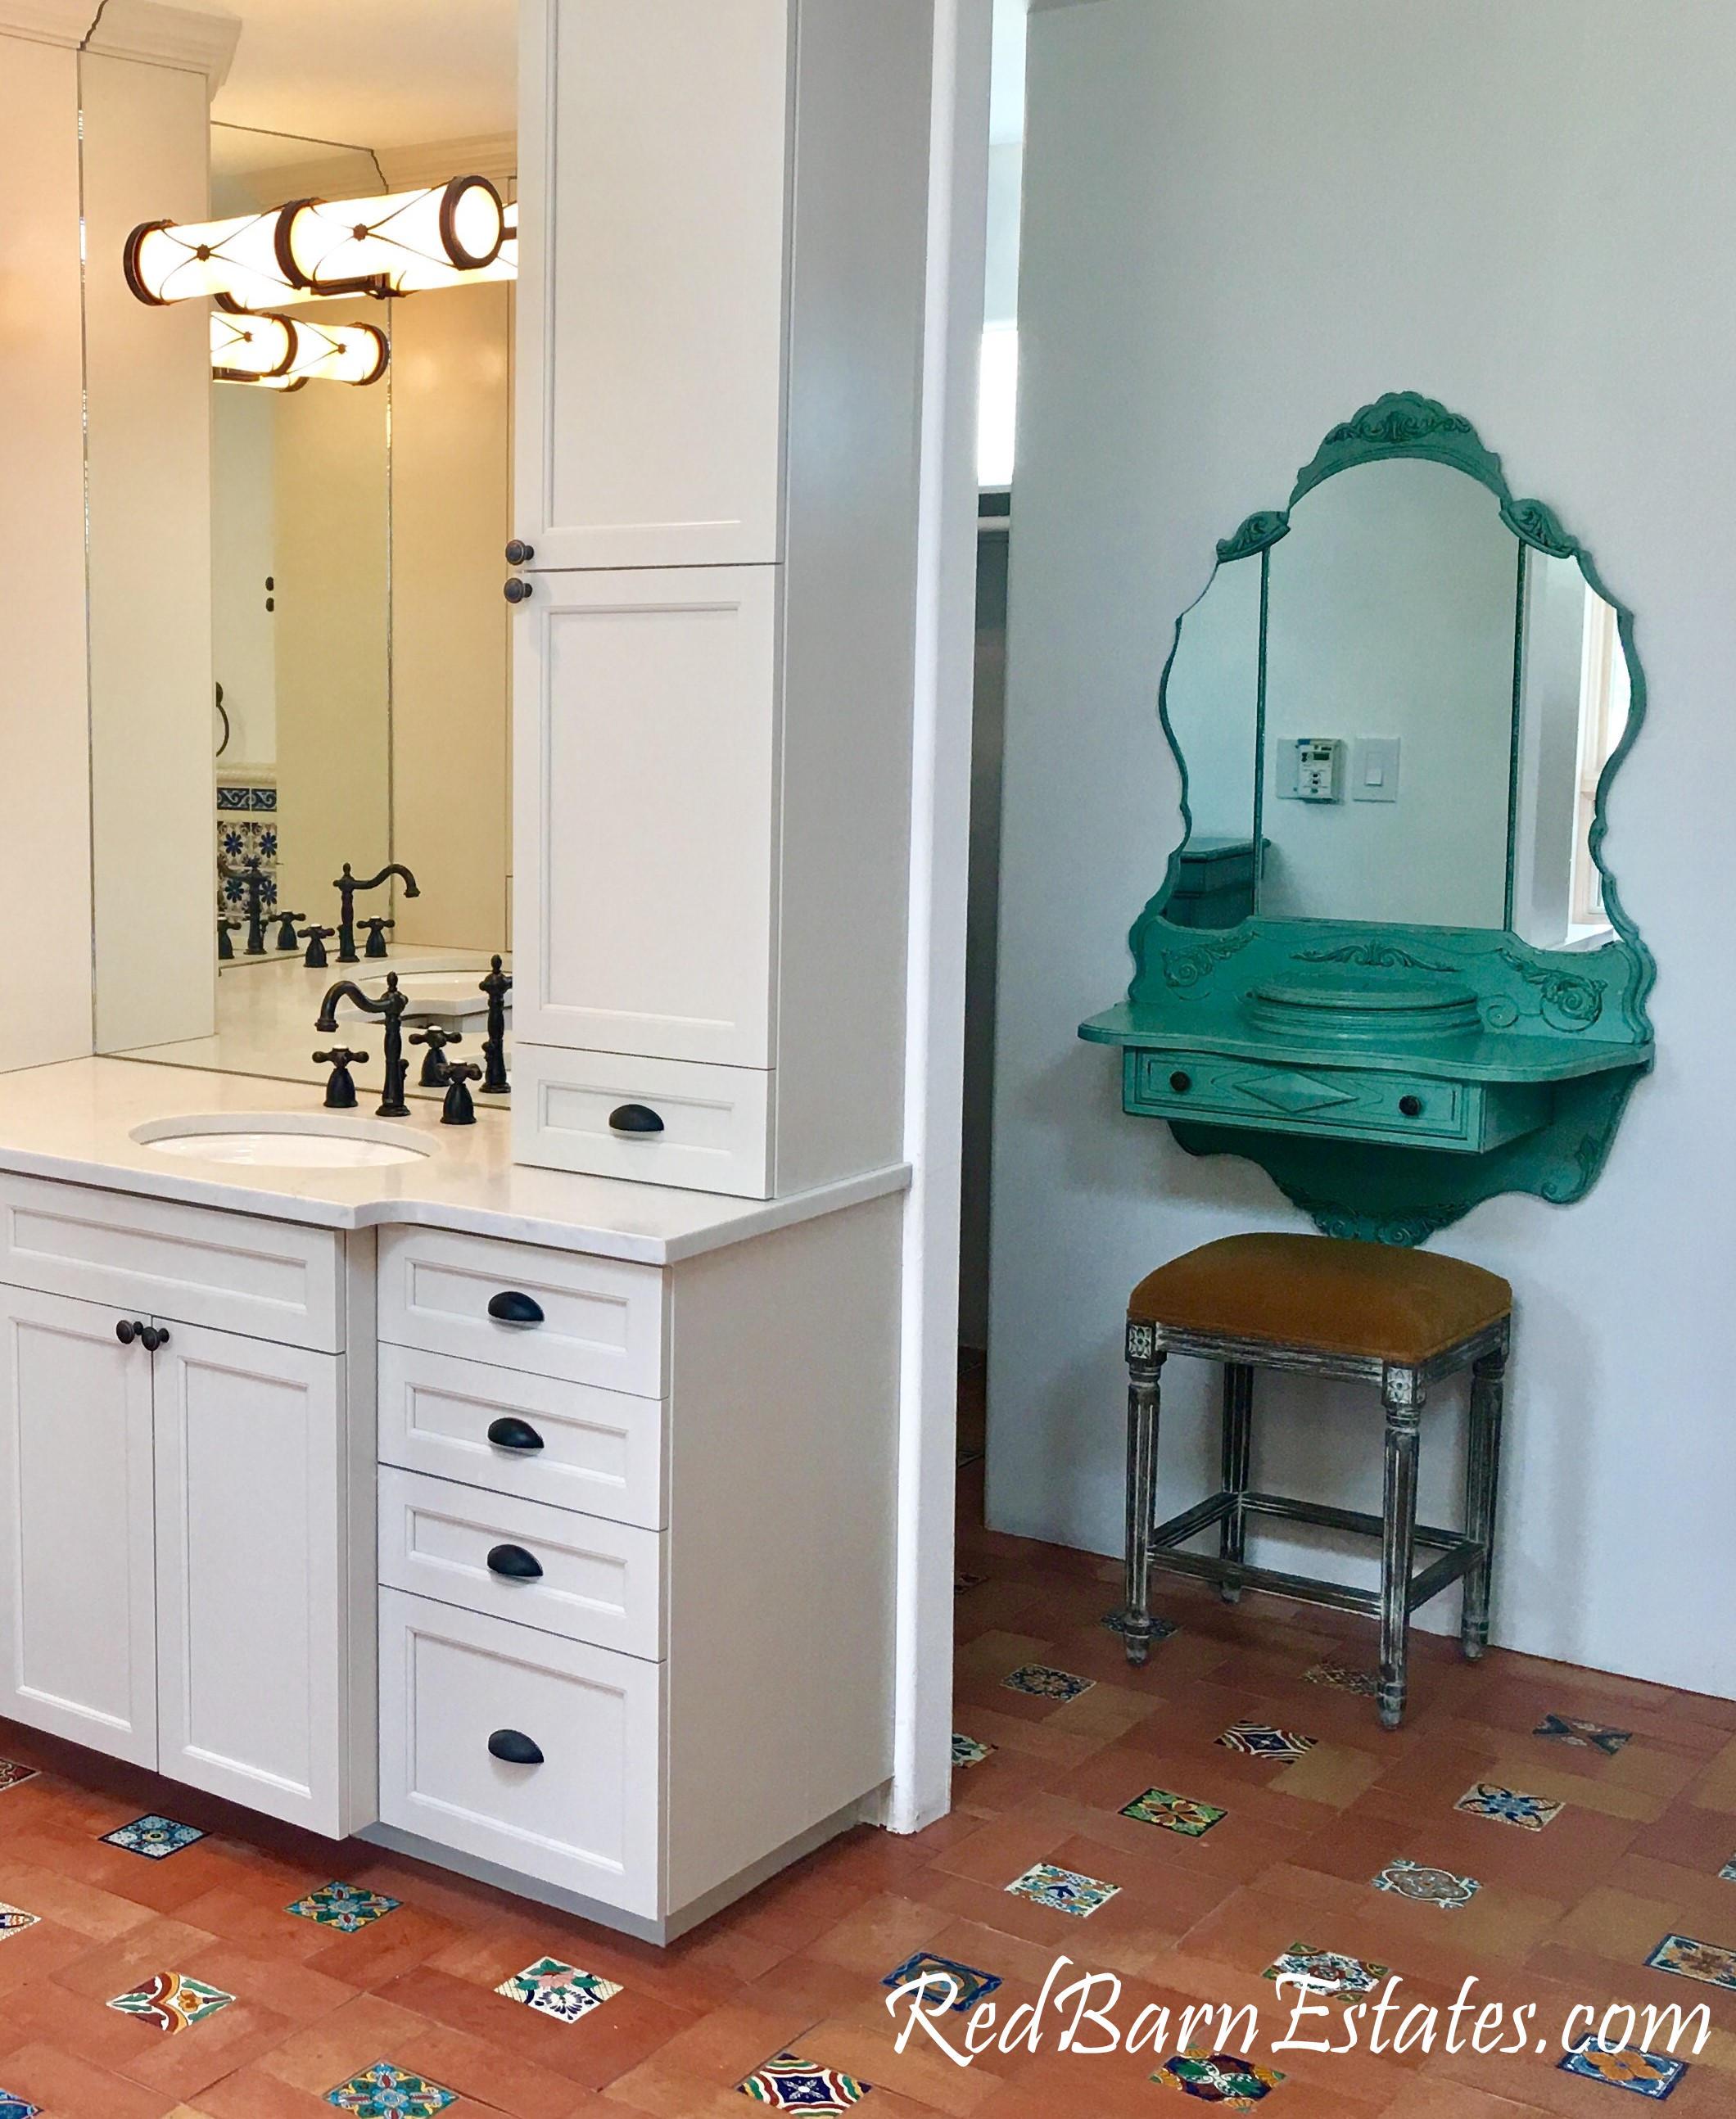 bath arbor repurposed divide ann builders direct your ideas lighting designer vanity sconces master bathroom excellent